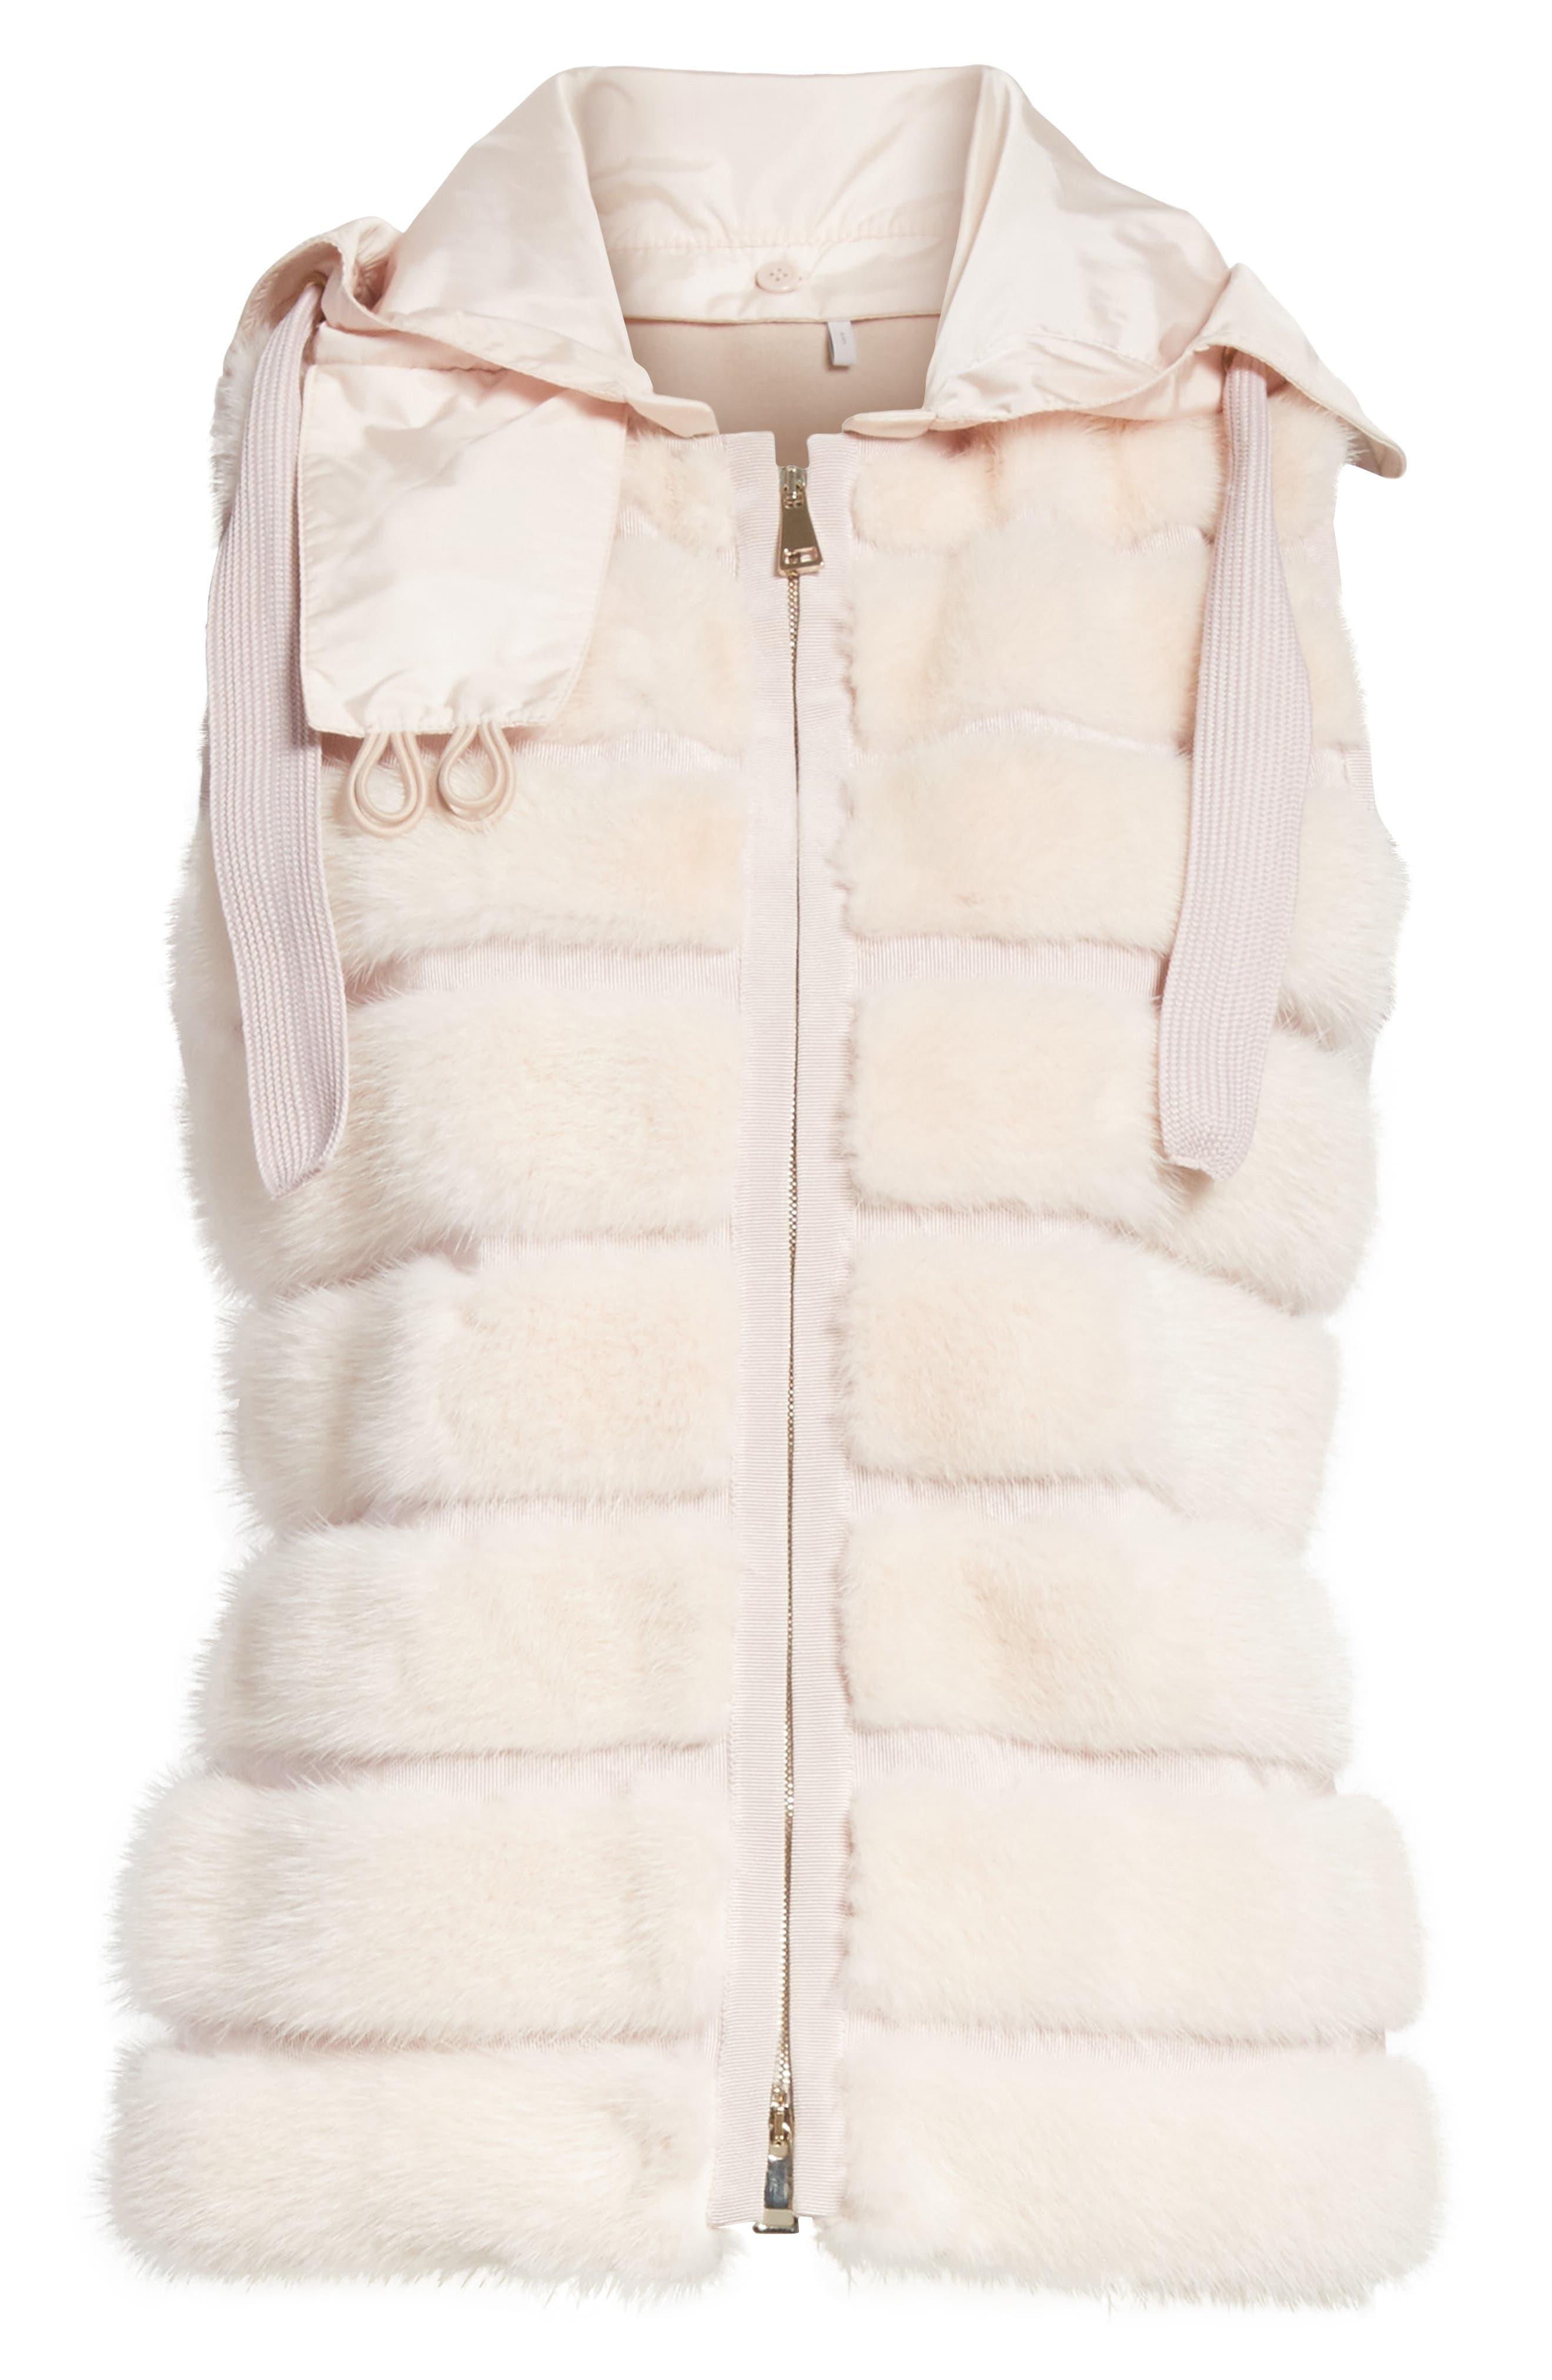 Ametrine Wool & Cashmere Vest with Genuine Mink Fur Trim & Removable Hood,                             Alternate thumbnail 5, color,                             680